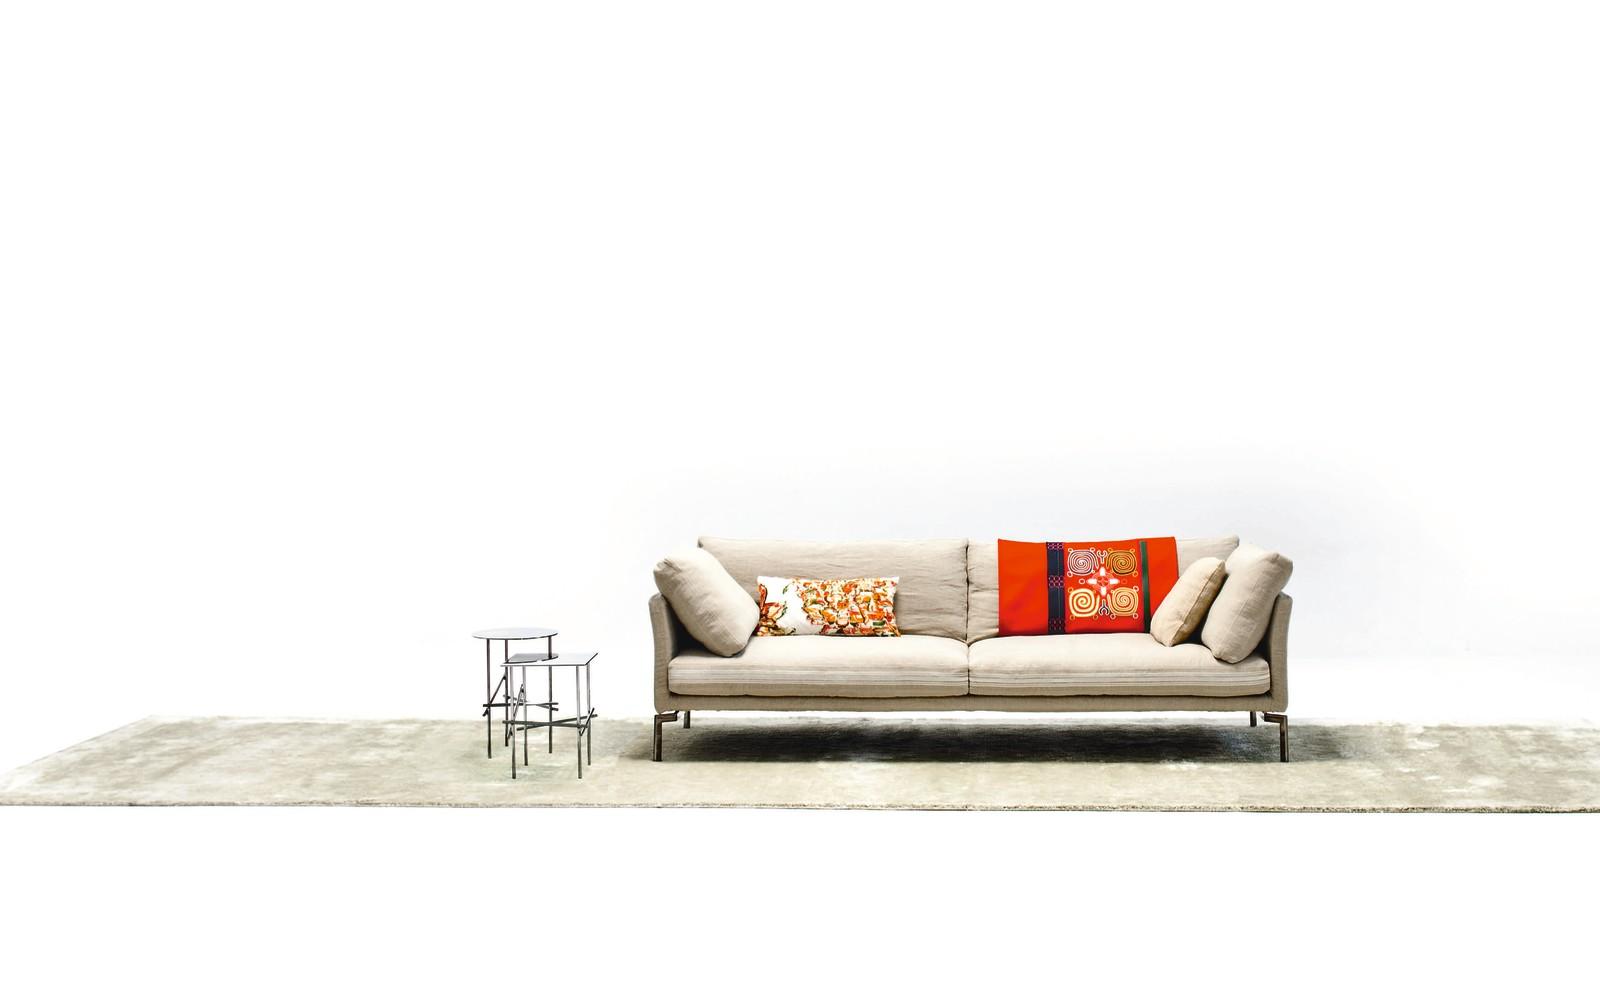 Miss Sarajevo Major 2 Seater Sofa A4500 - Art.48045 - 206 beige, Chrome Feet